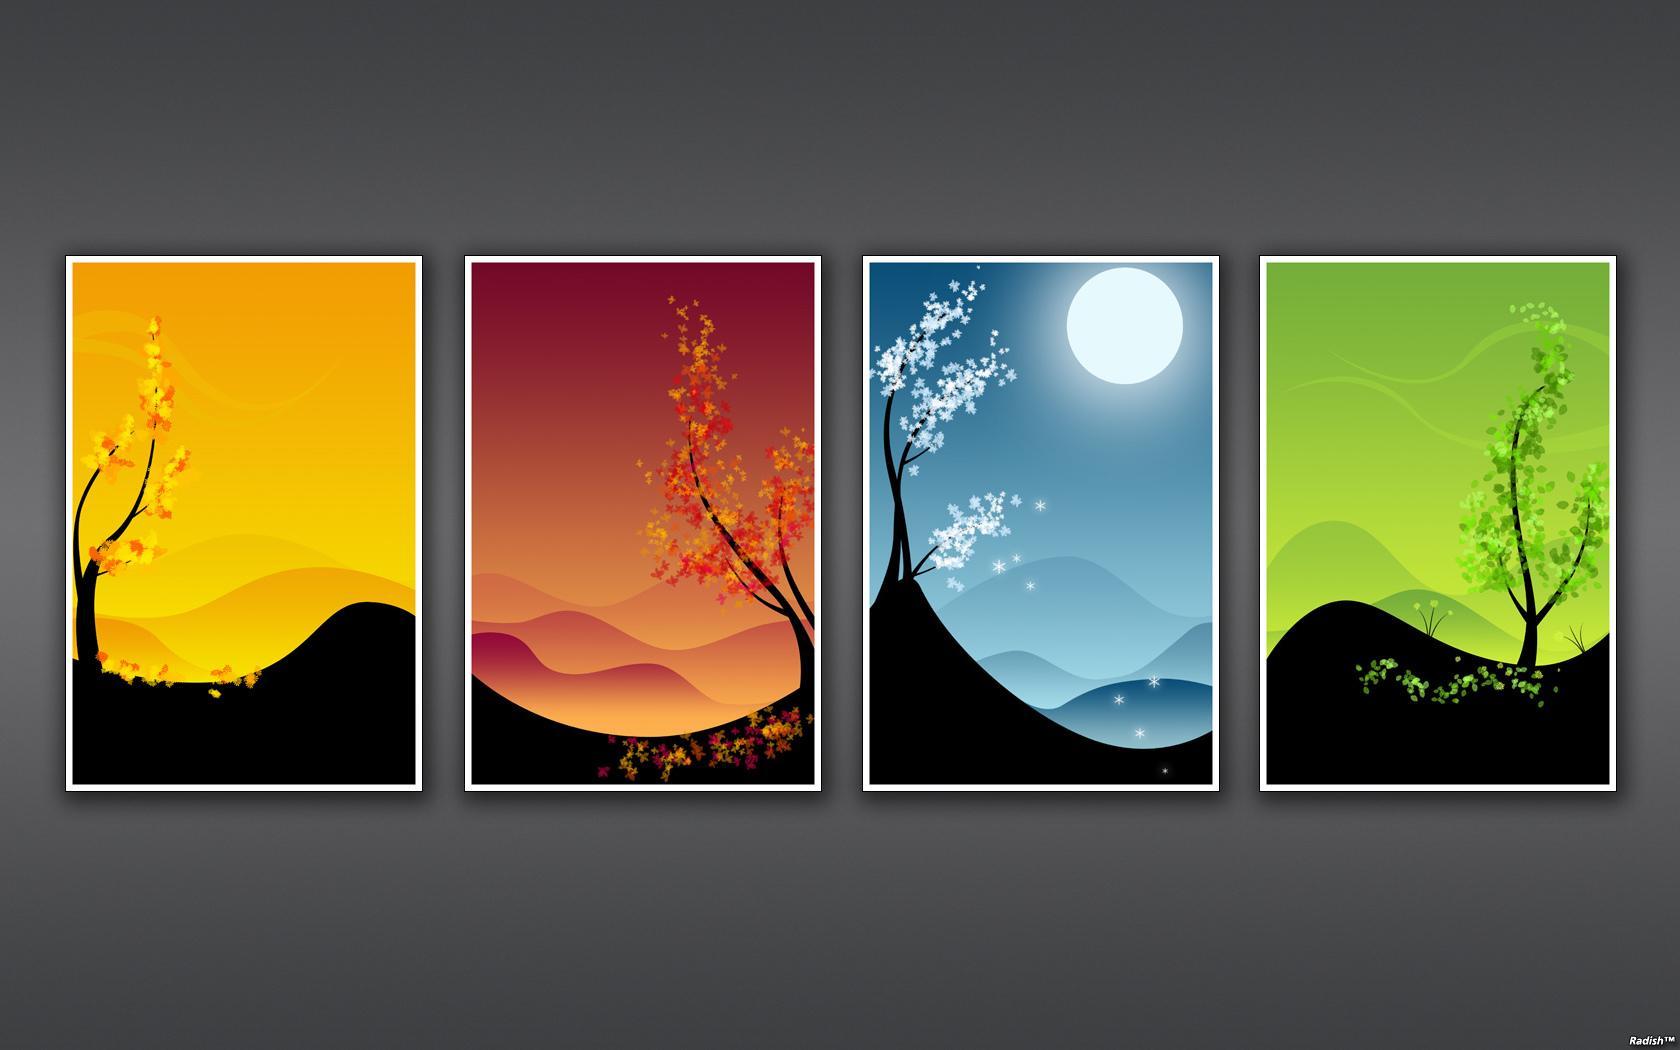 Season Artistic wallpapers HD quality